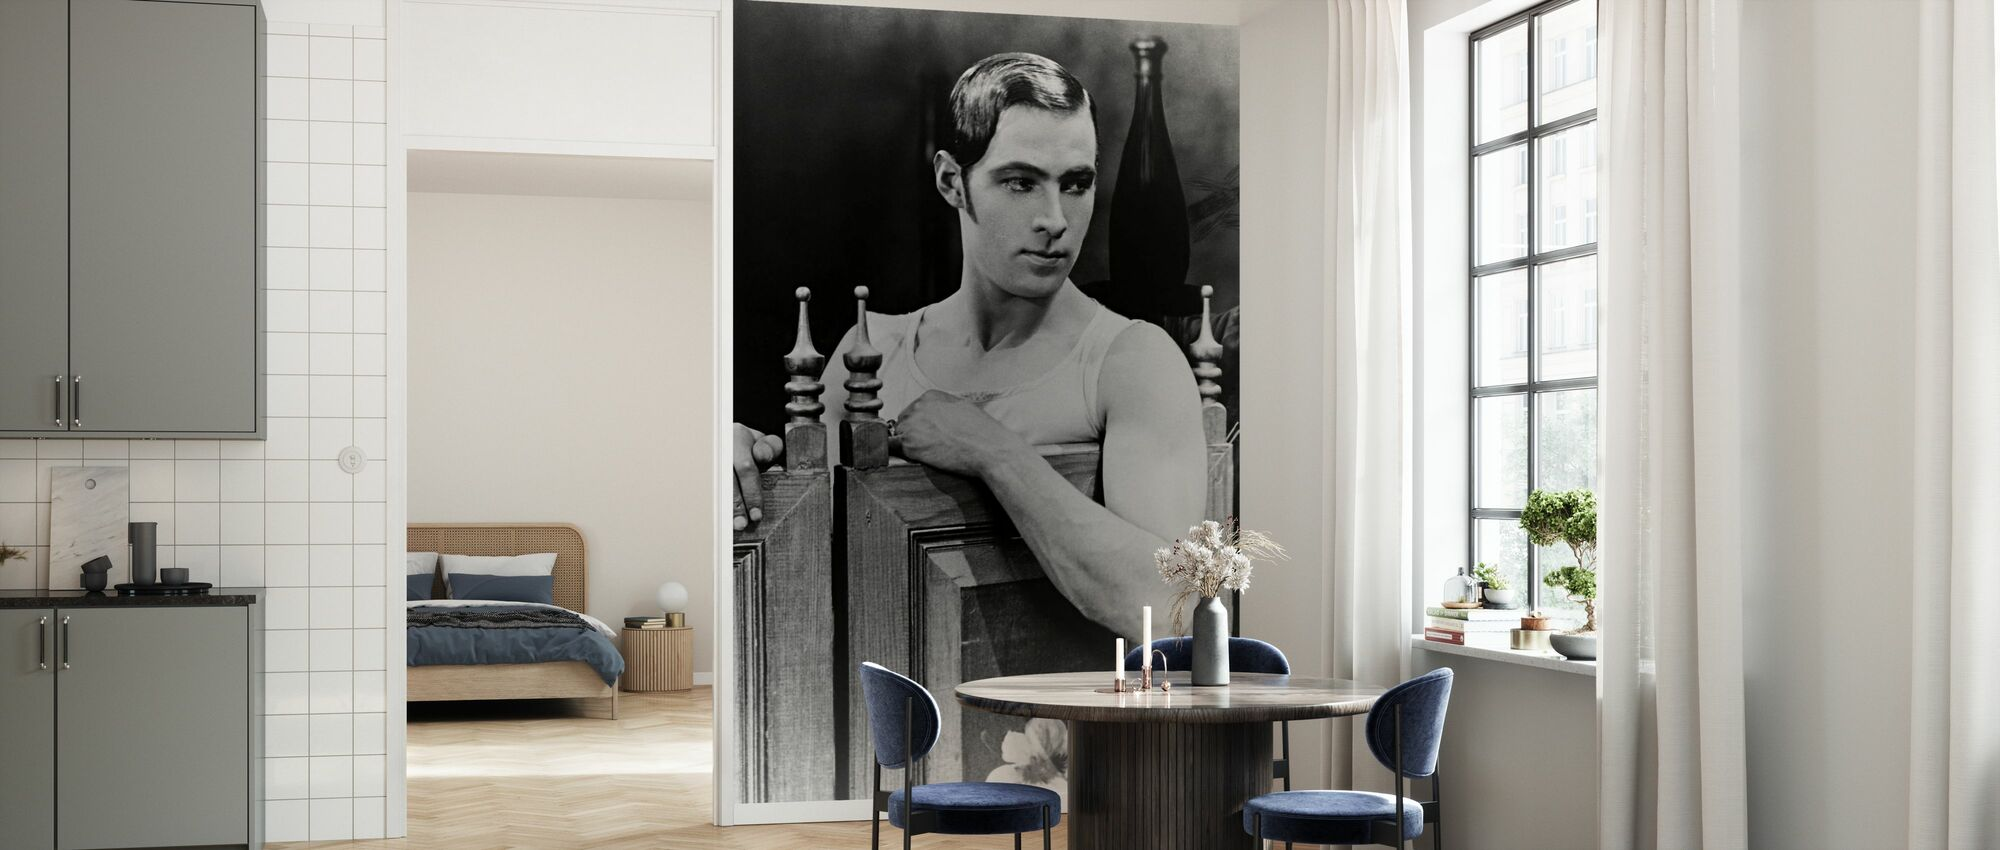 Blood and Sand - Rudolph Valentino - Wallpaper - Kitchen